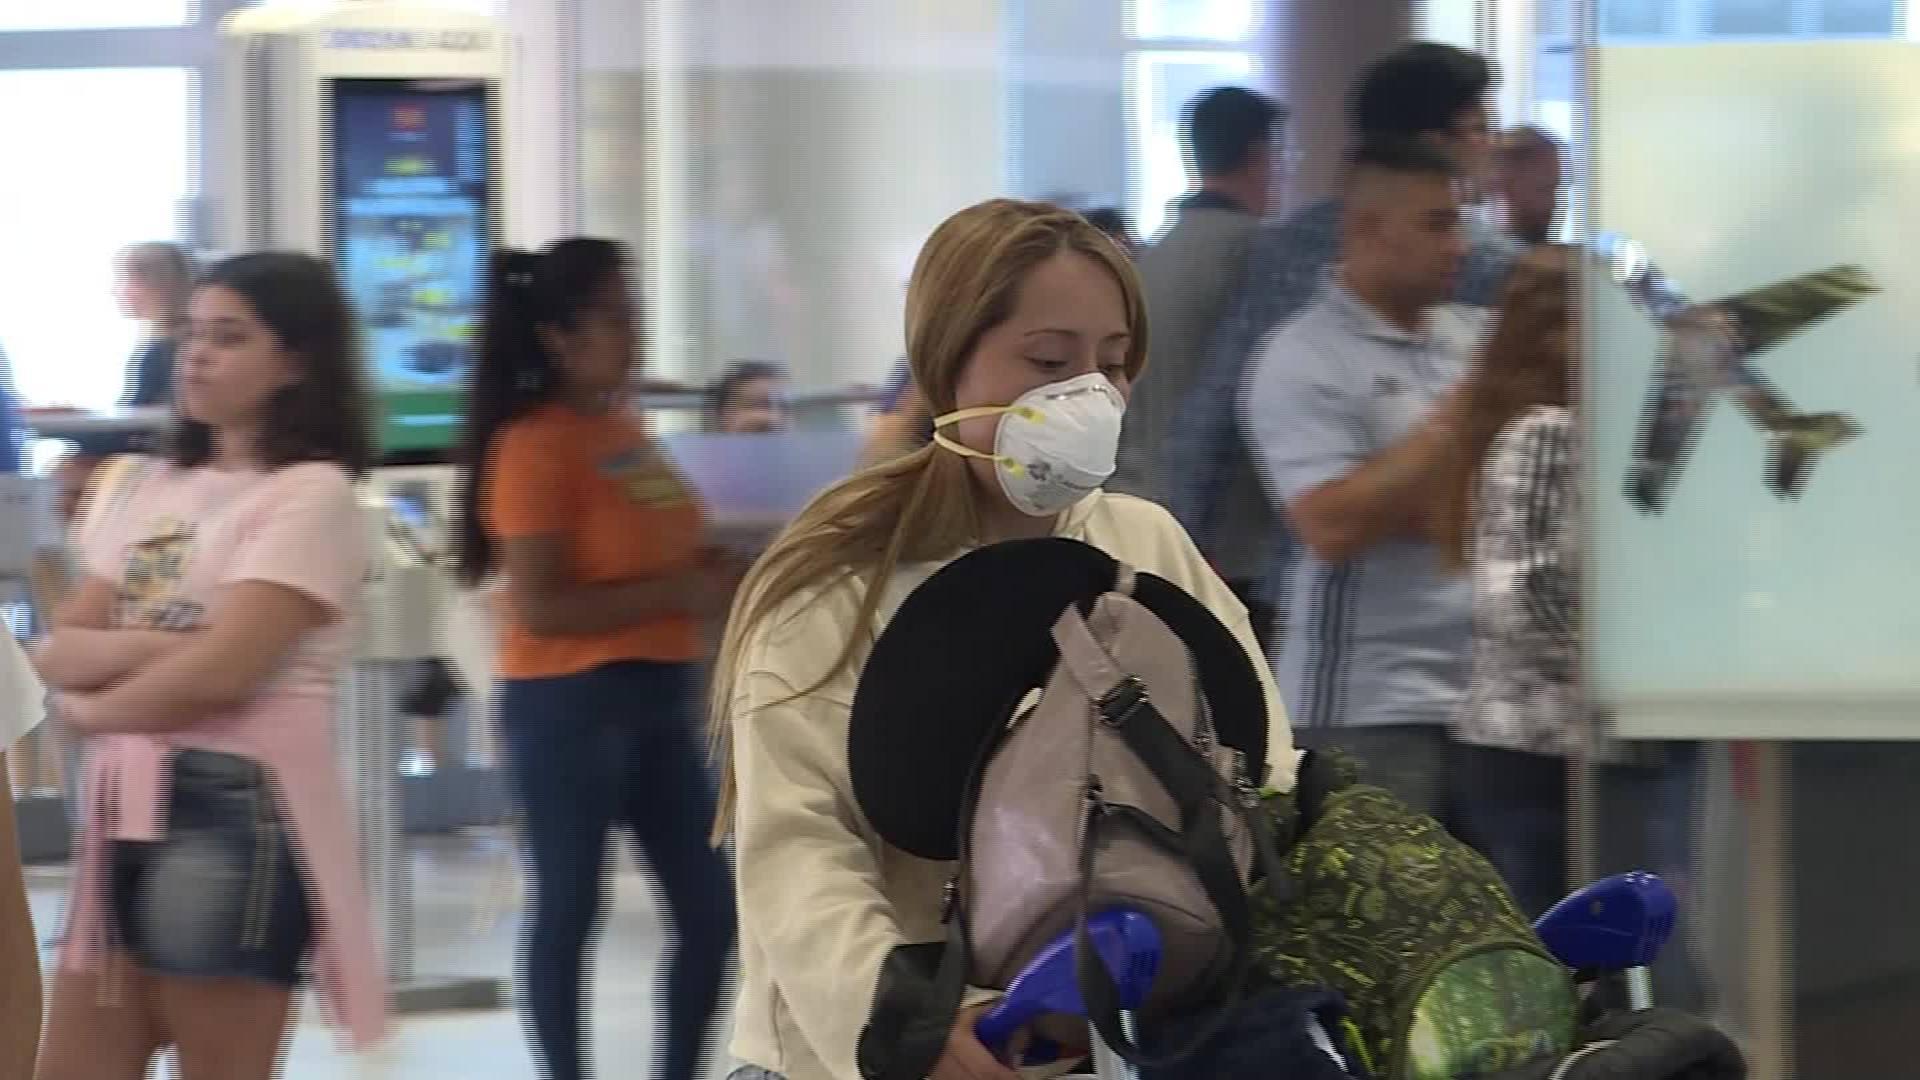 200316185855-argentina-turismo-efectos-coronavirus-pandemia-pkg-hugo-correa-00001009